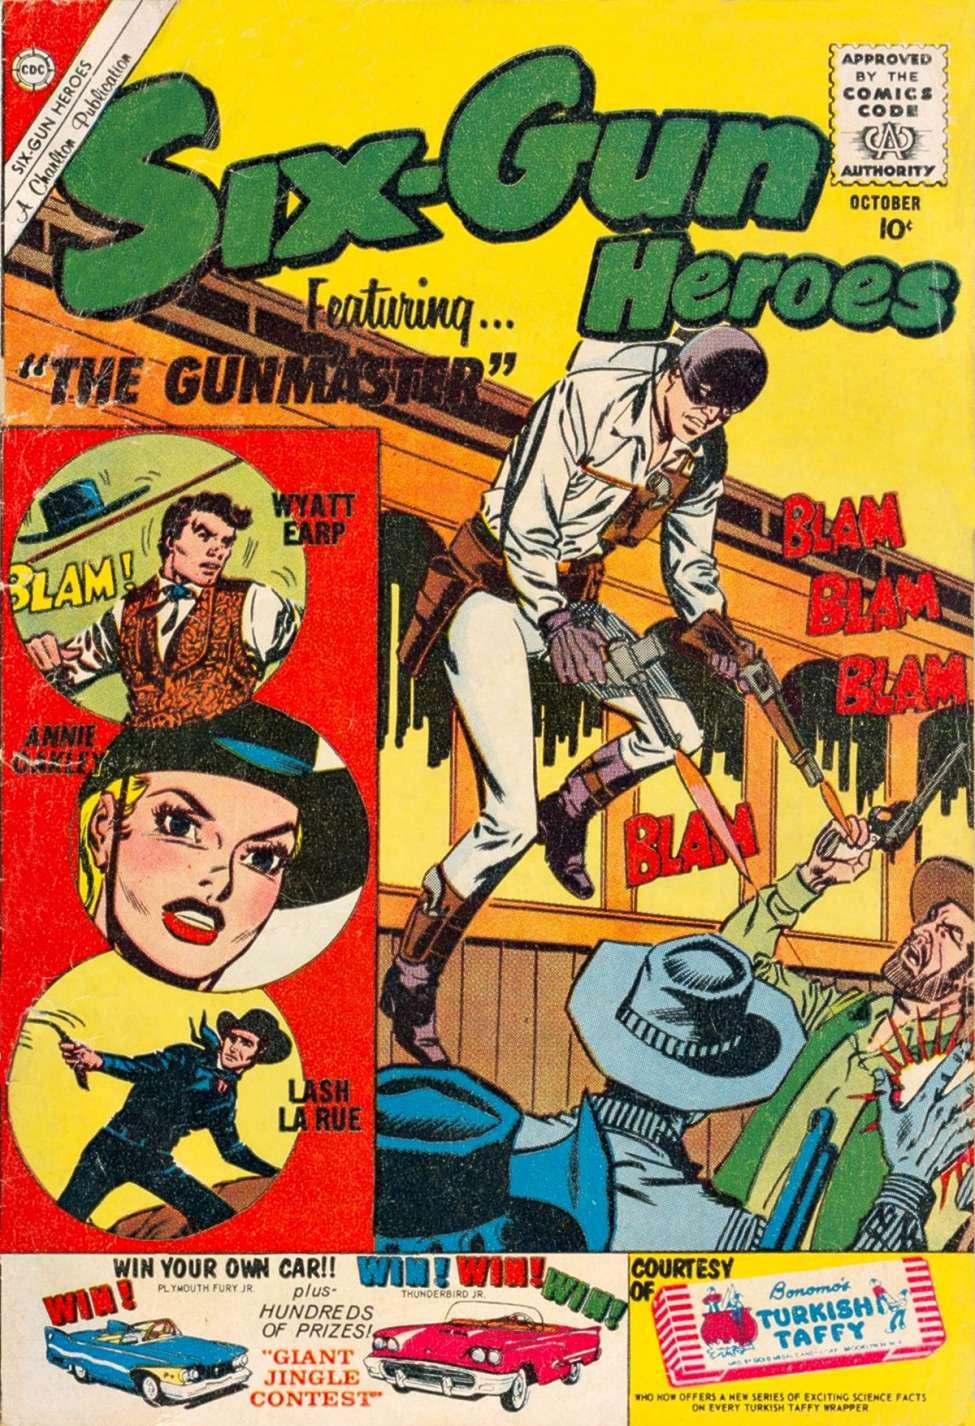 Comic Book Cover For Six-Gun Heroes #59